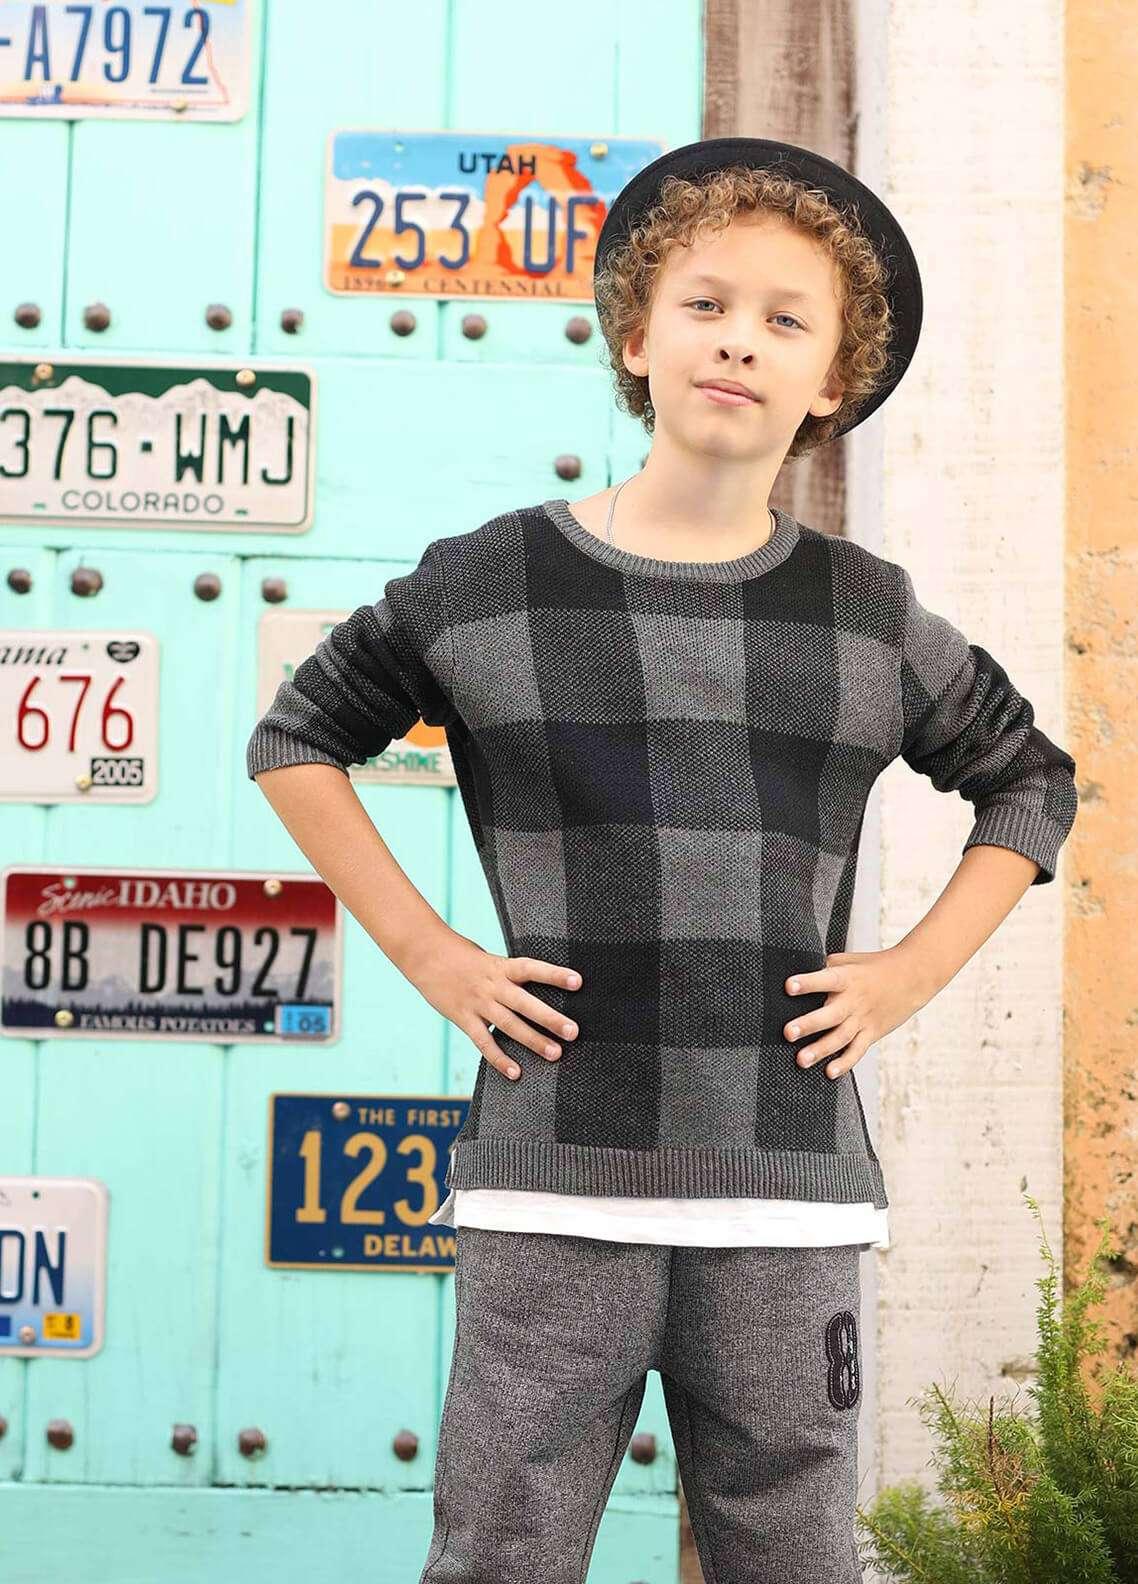 b052422dd Buy Edenrobe Cotton Full Sleeves Boys Tees - Charcoal 002444- Online ...